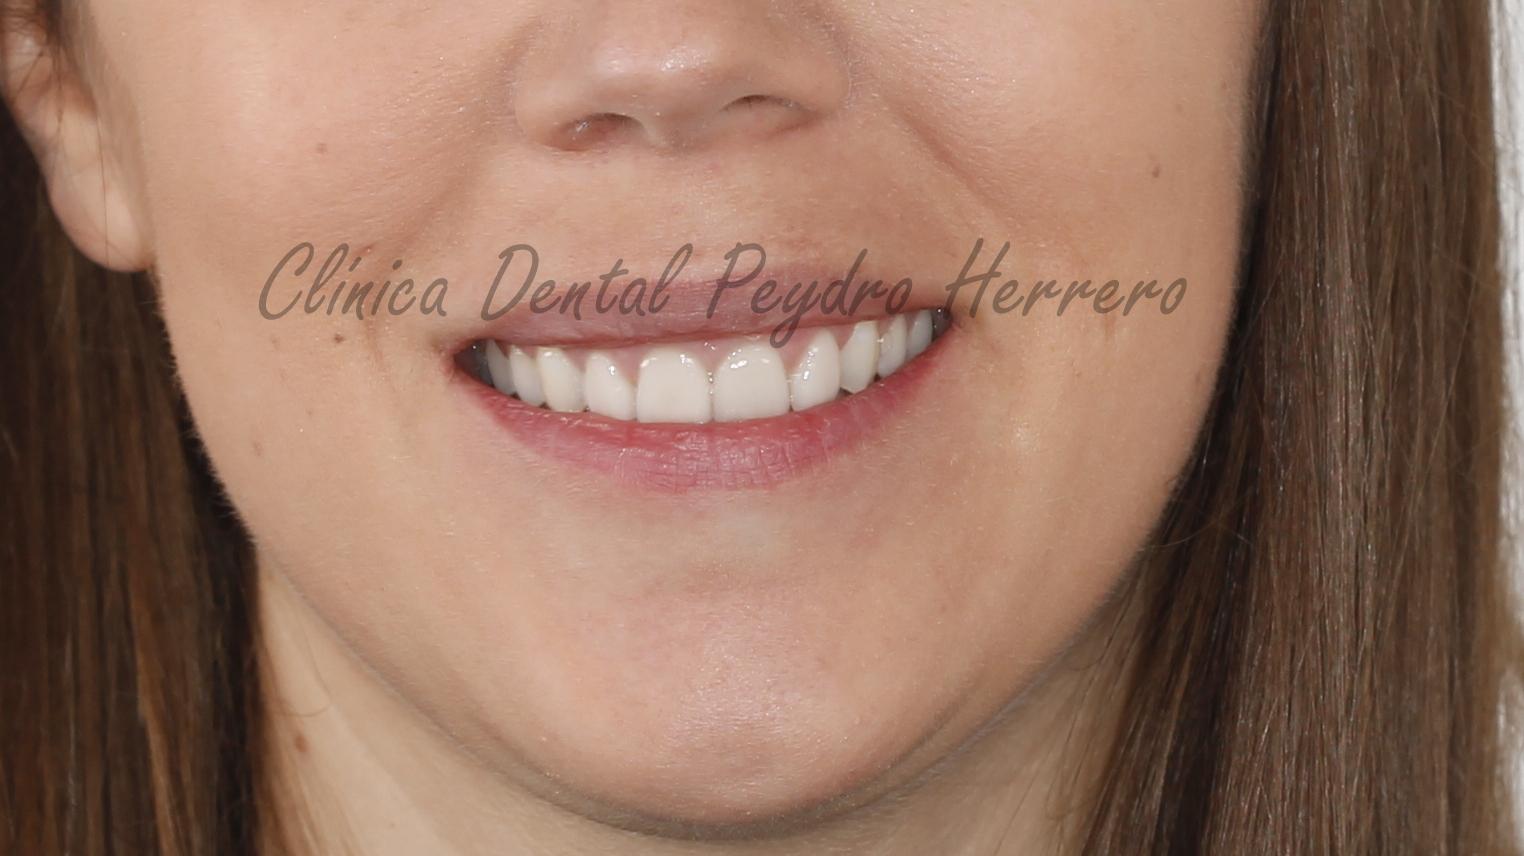 tratamiento de ortodoncia invislaign